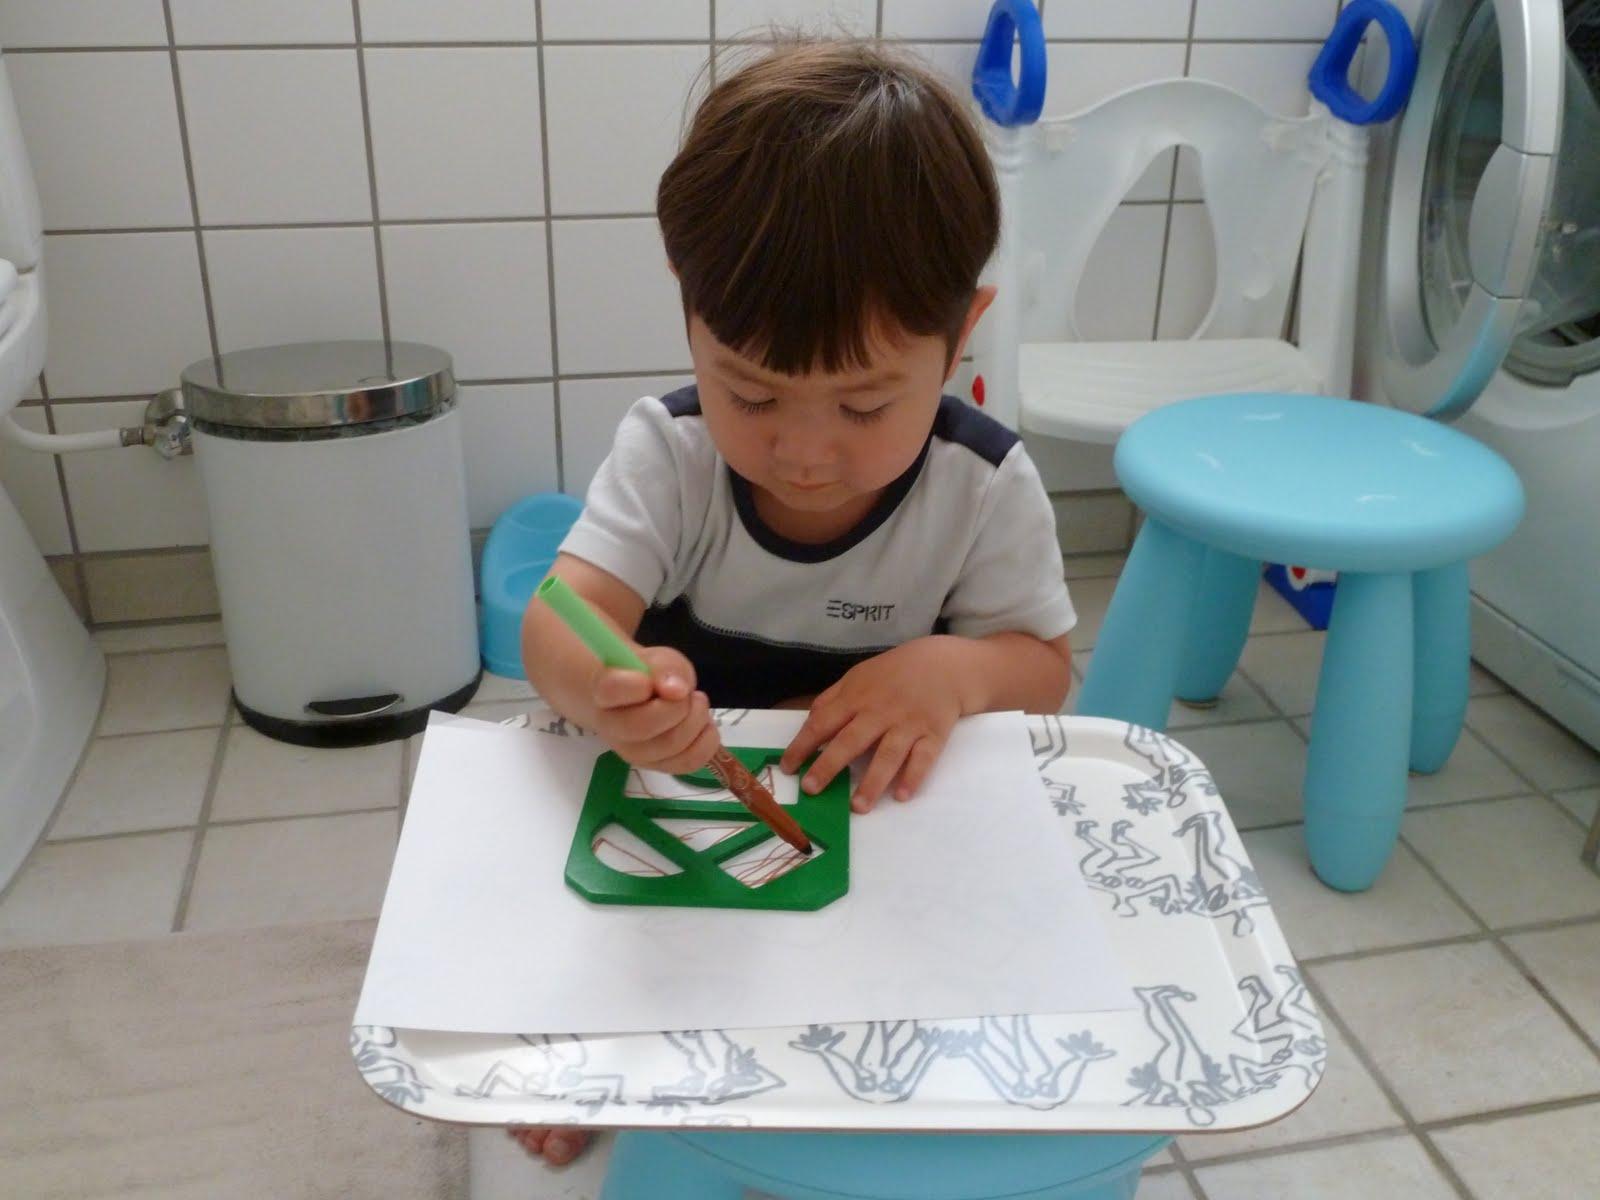 Family Fecs Montessori Activity Tracing Shapes